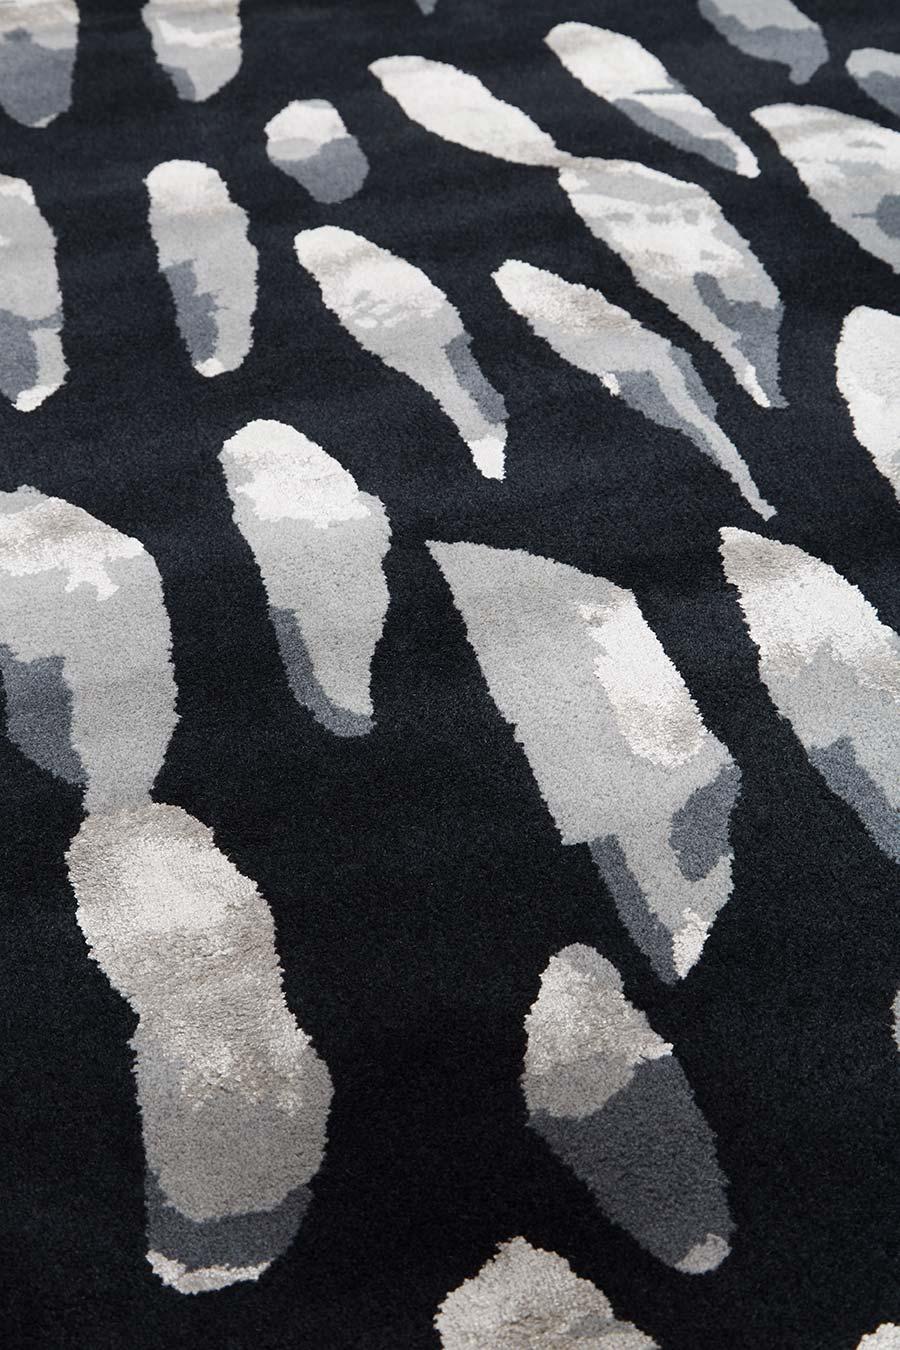 Detailed image of charcoal Rain Drops rug